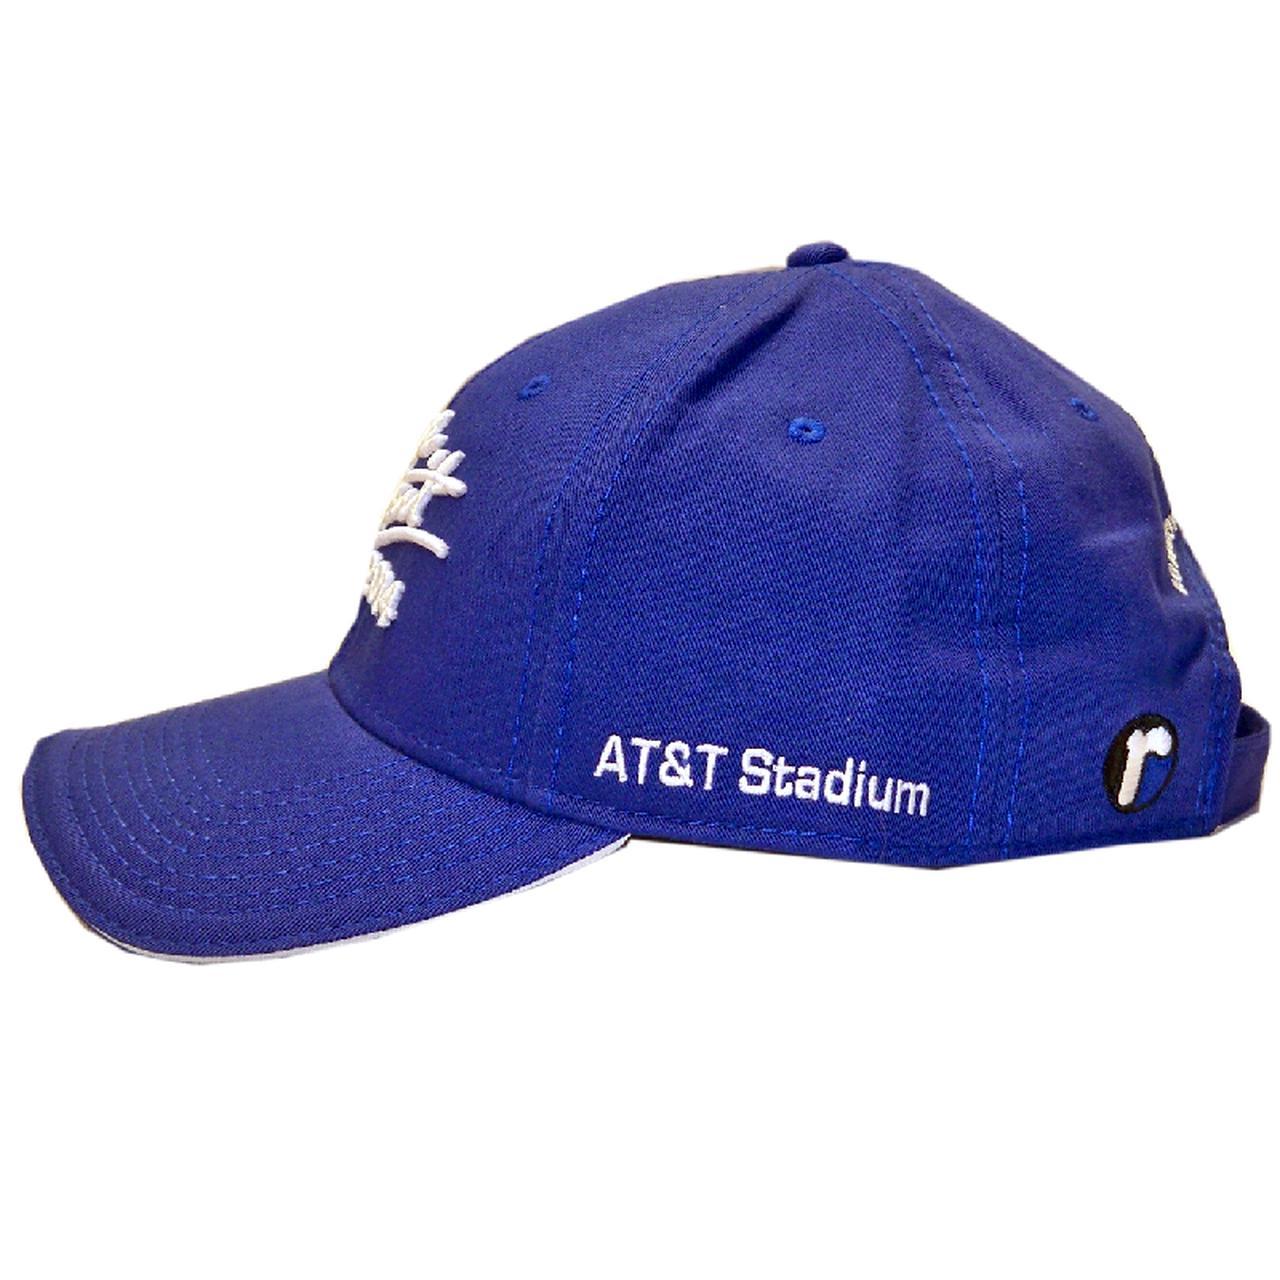 George Strait. 2014 Royal Blue Final Show Ballcap 893a8b7db4b